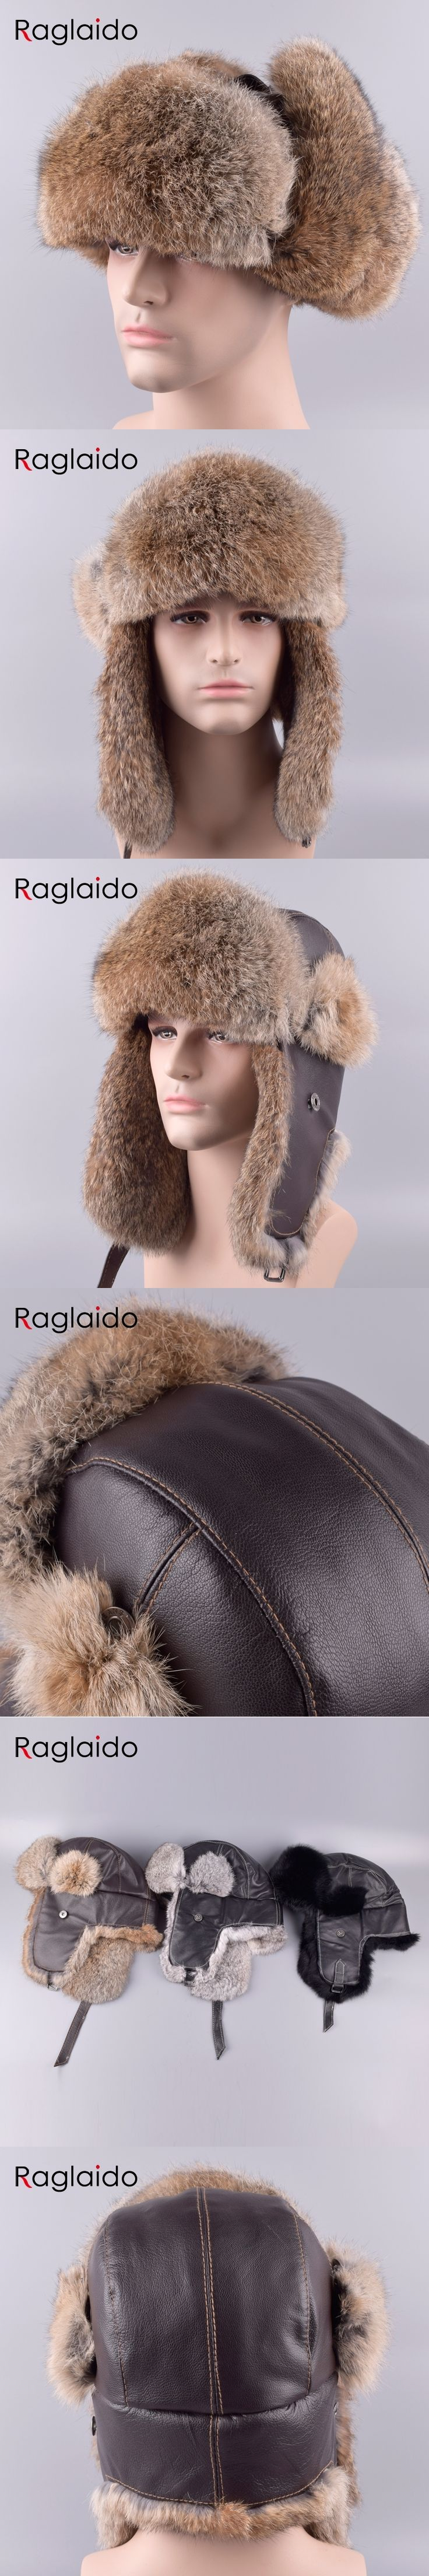 Raglaido Ushanka Fur Hats Outdoor Winter Real Rabbit Fur Trapper Hats+Genuine leather Adult snow caps Russian ear cap LQ11201R